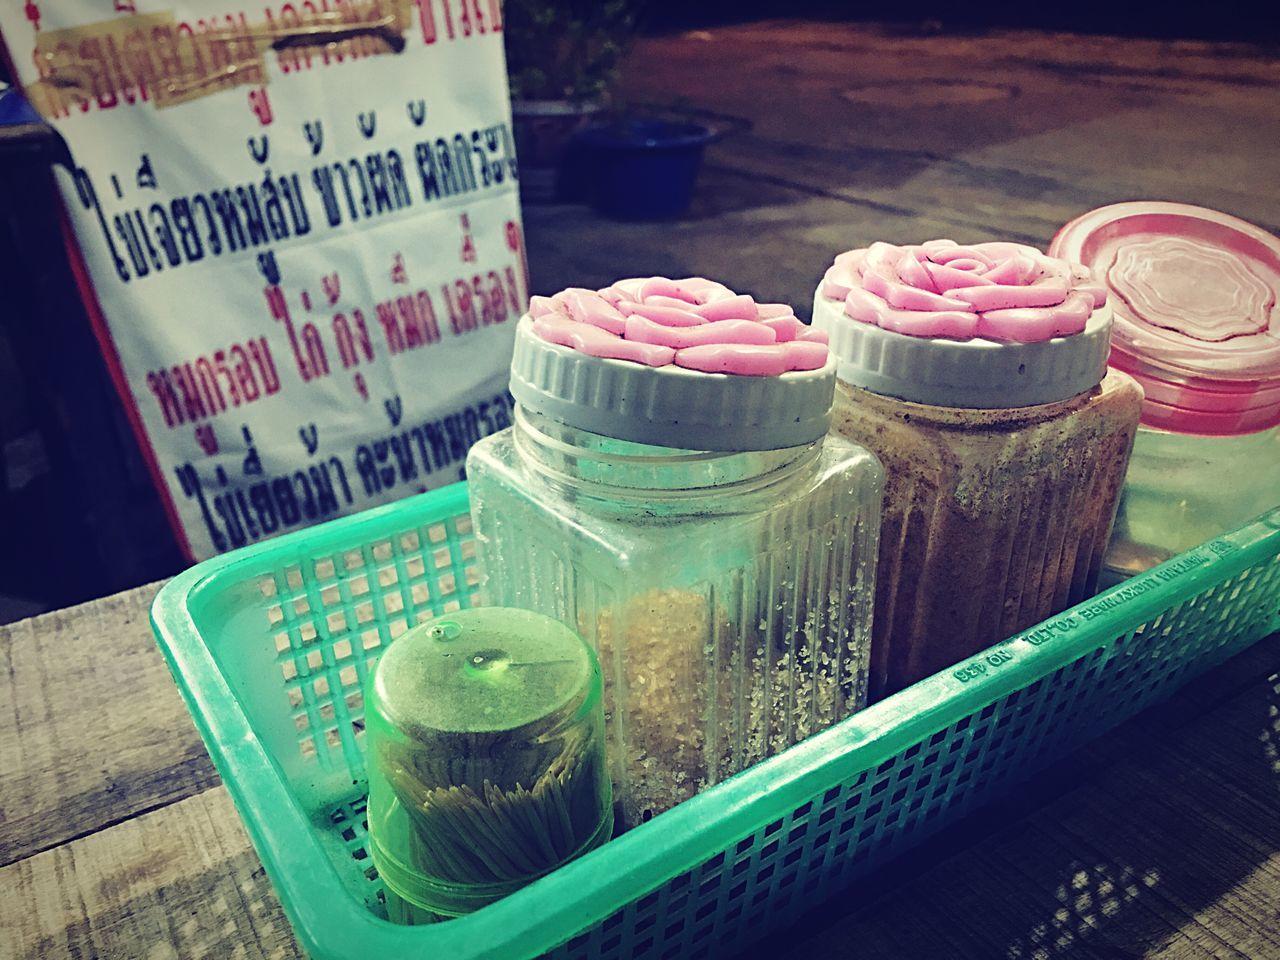 Thai garnish Jar No People Indoors  Close-up Freshness Day Food Stick Sugar Chilies Sale Shop